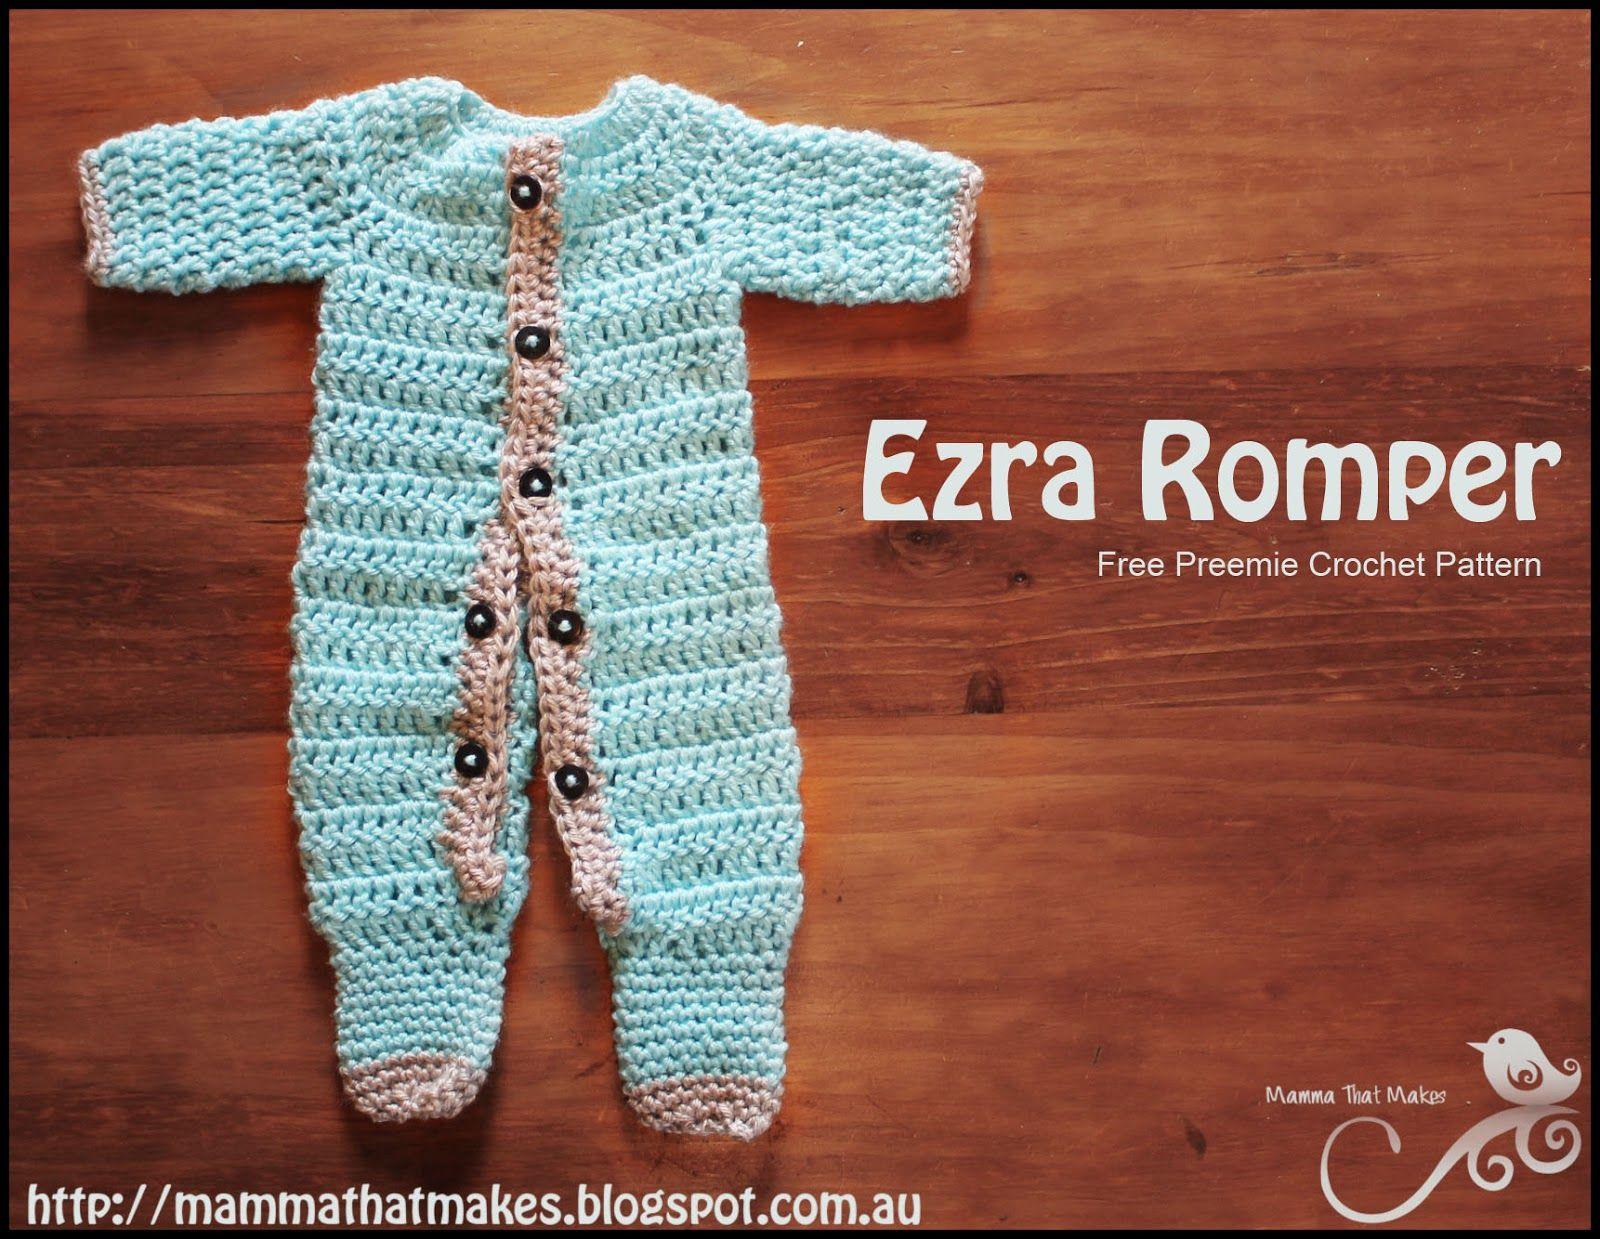 Ezra romper a free crochet prem baby pattern from mamma that a free crochet prem baby pattern from mamma that makes bankloansurffo Gallery